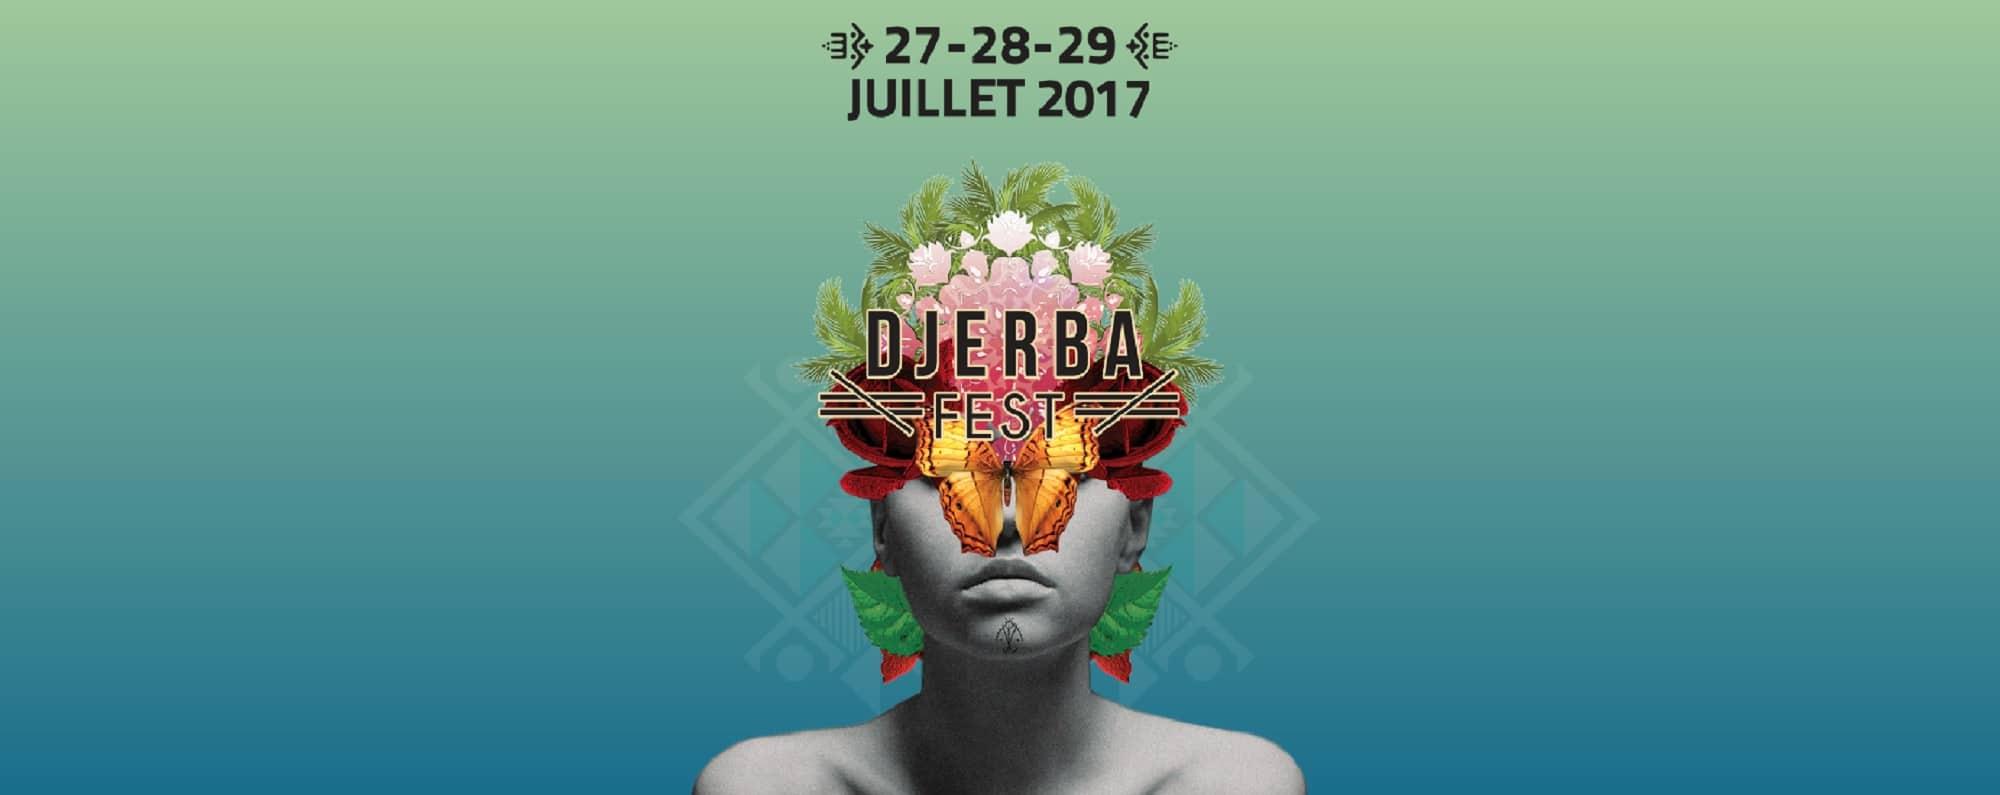 Djerba festivals Tunesië